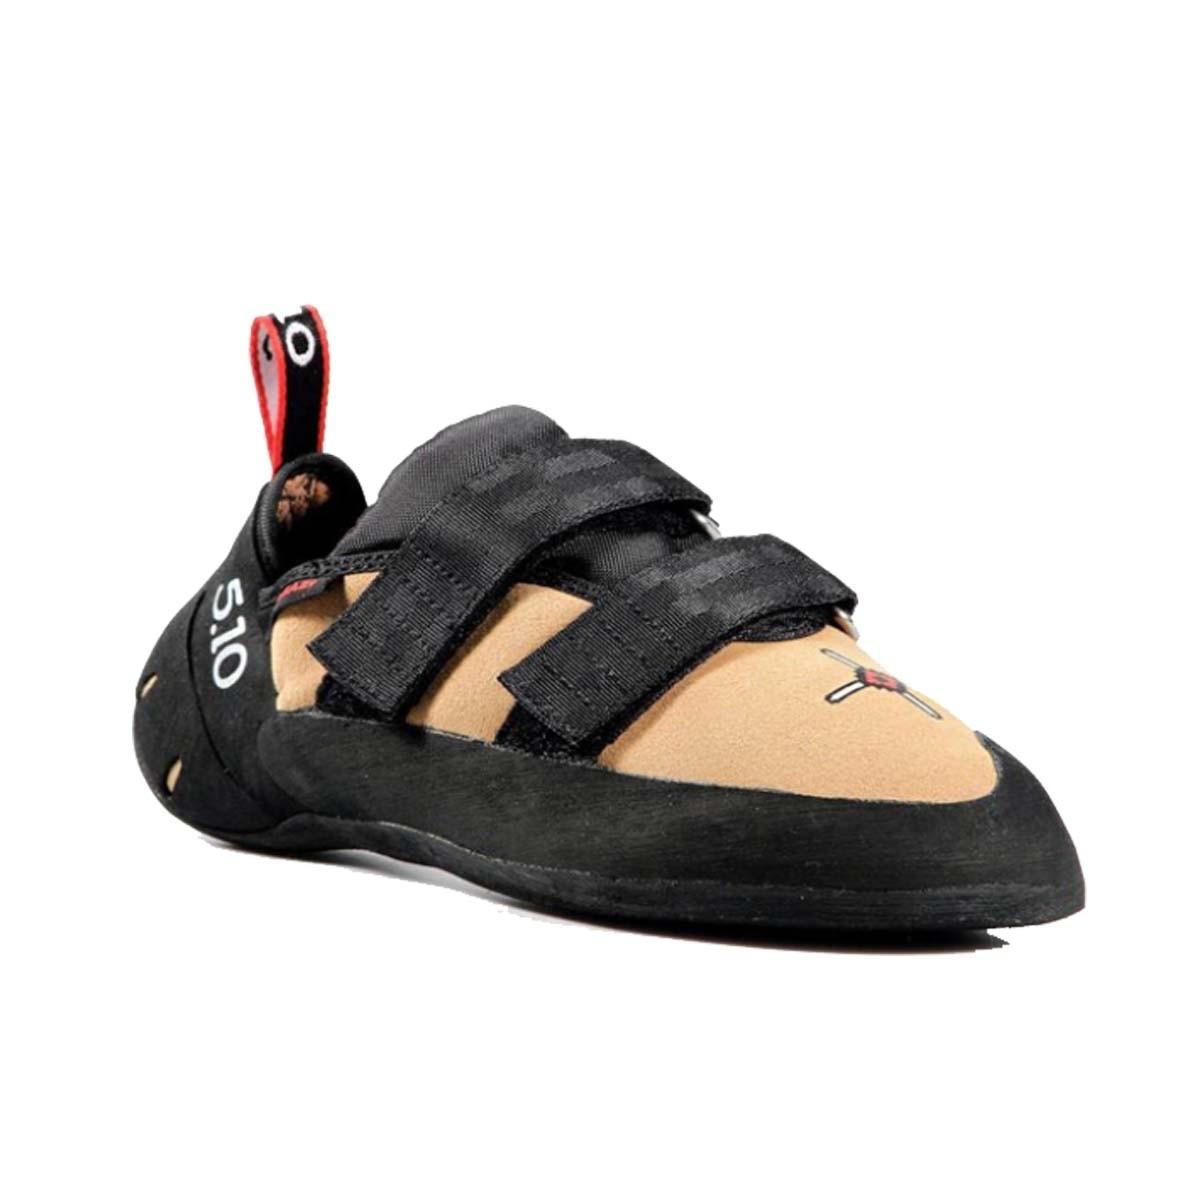 Sapatilha Anasazi Velcro Five Ten